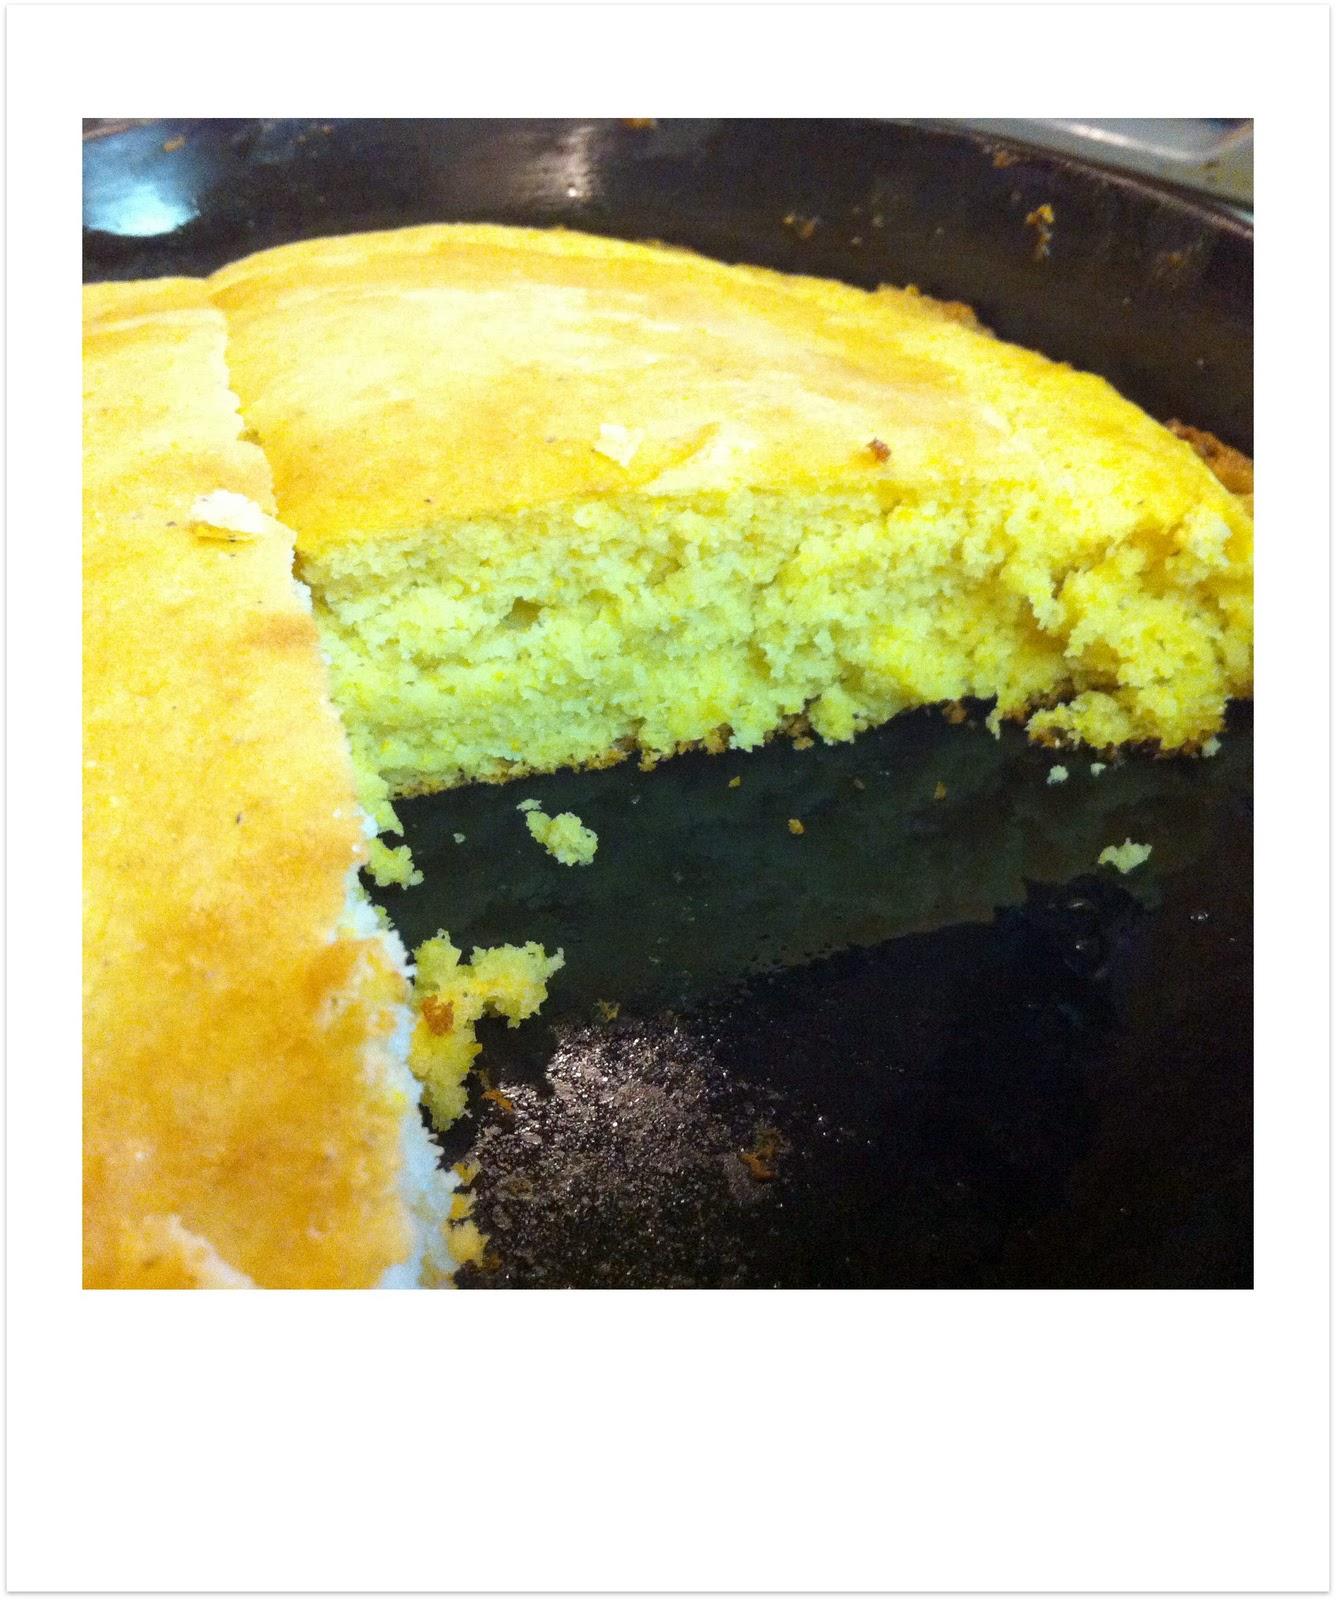 Gluten Free Cornmeal Cake Recipe